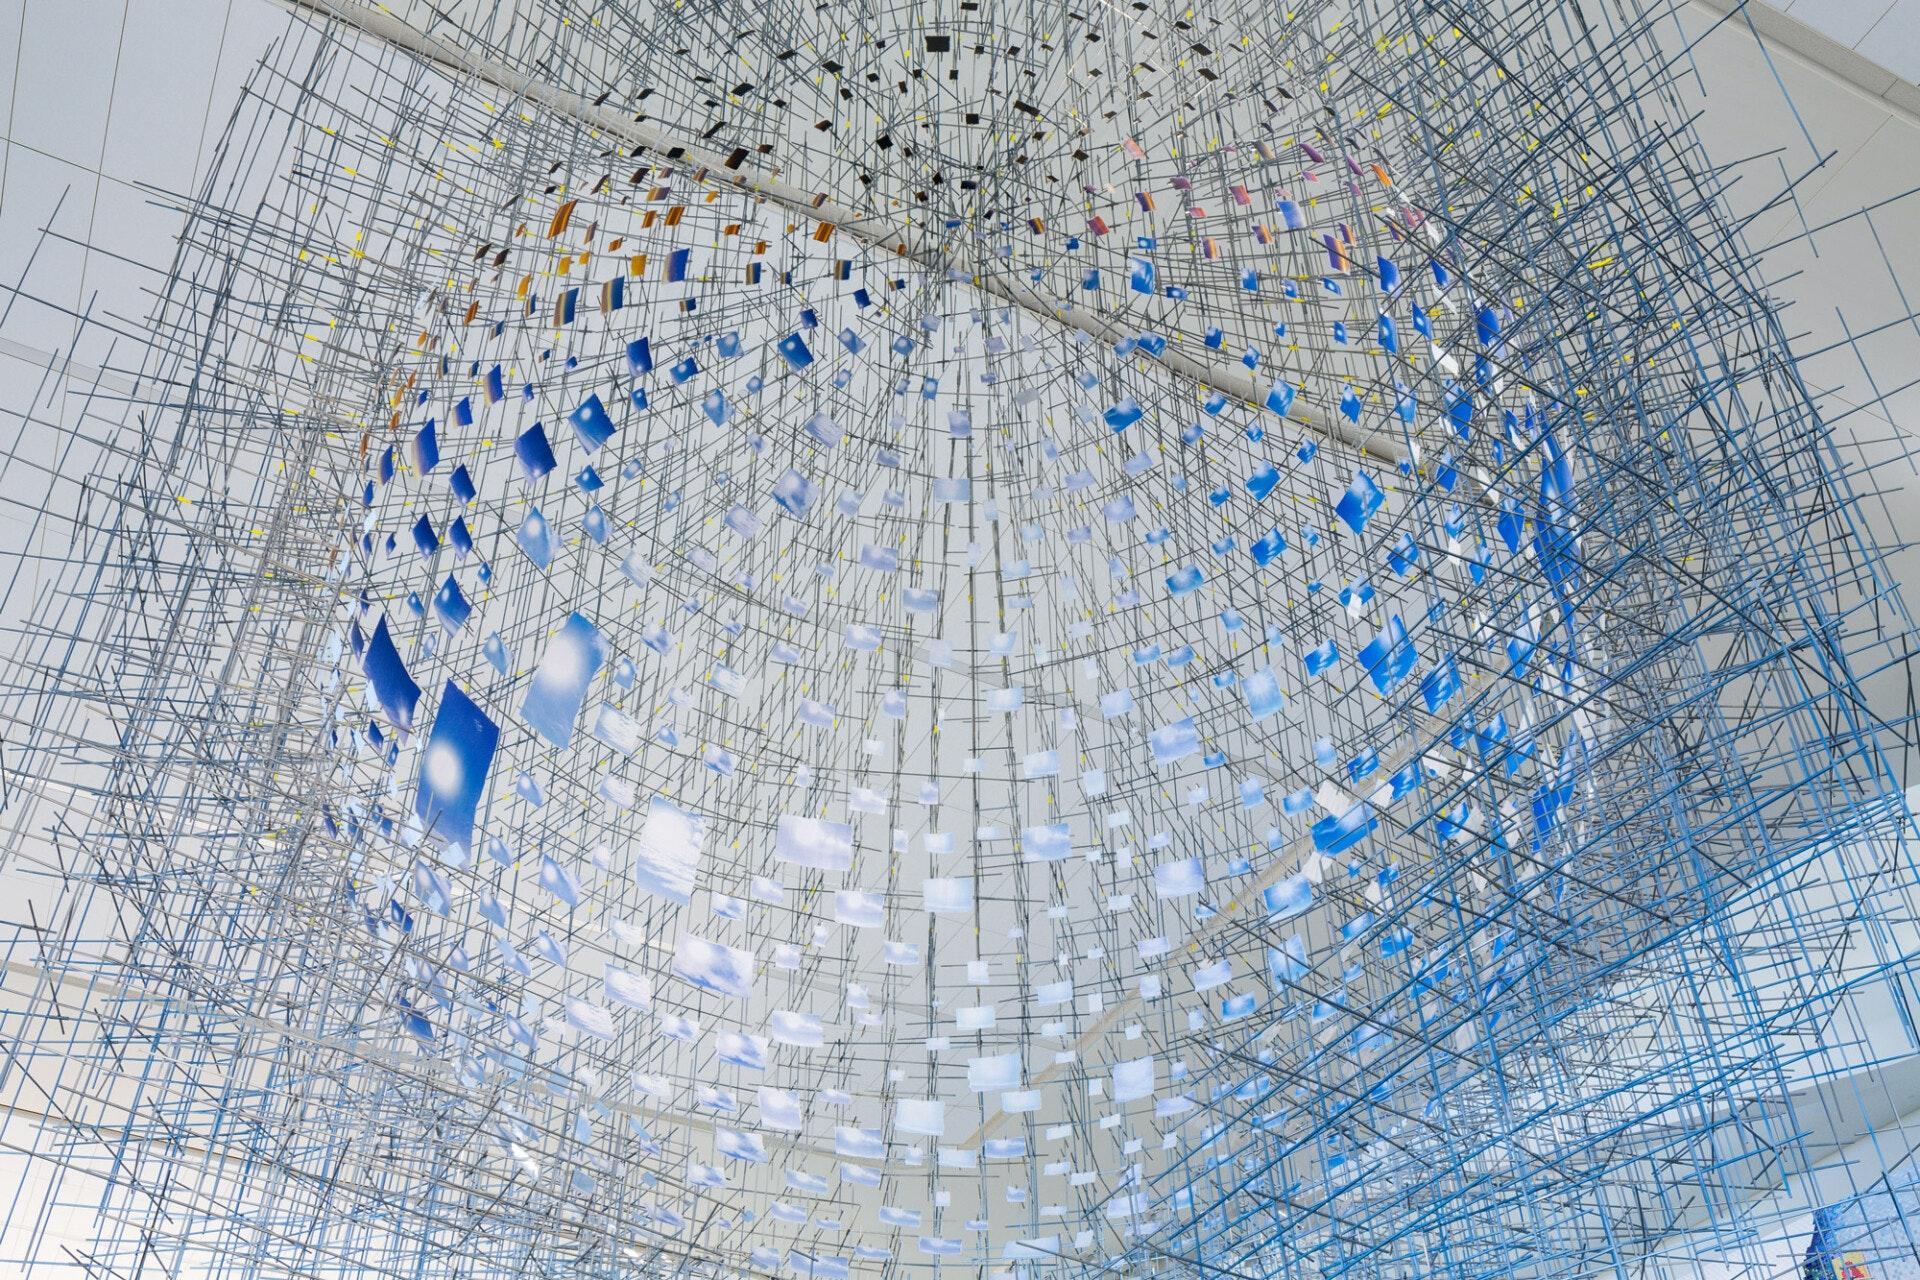 A detail of Sarah Sze's installation